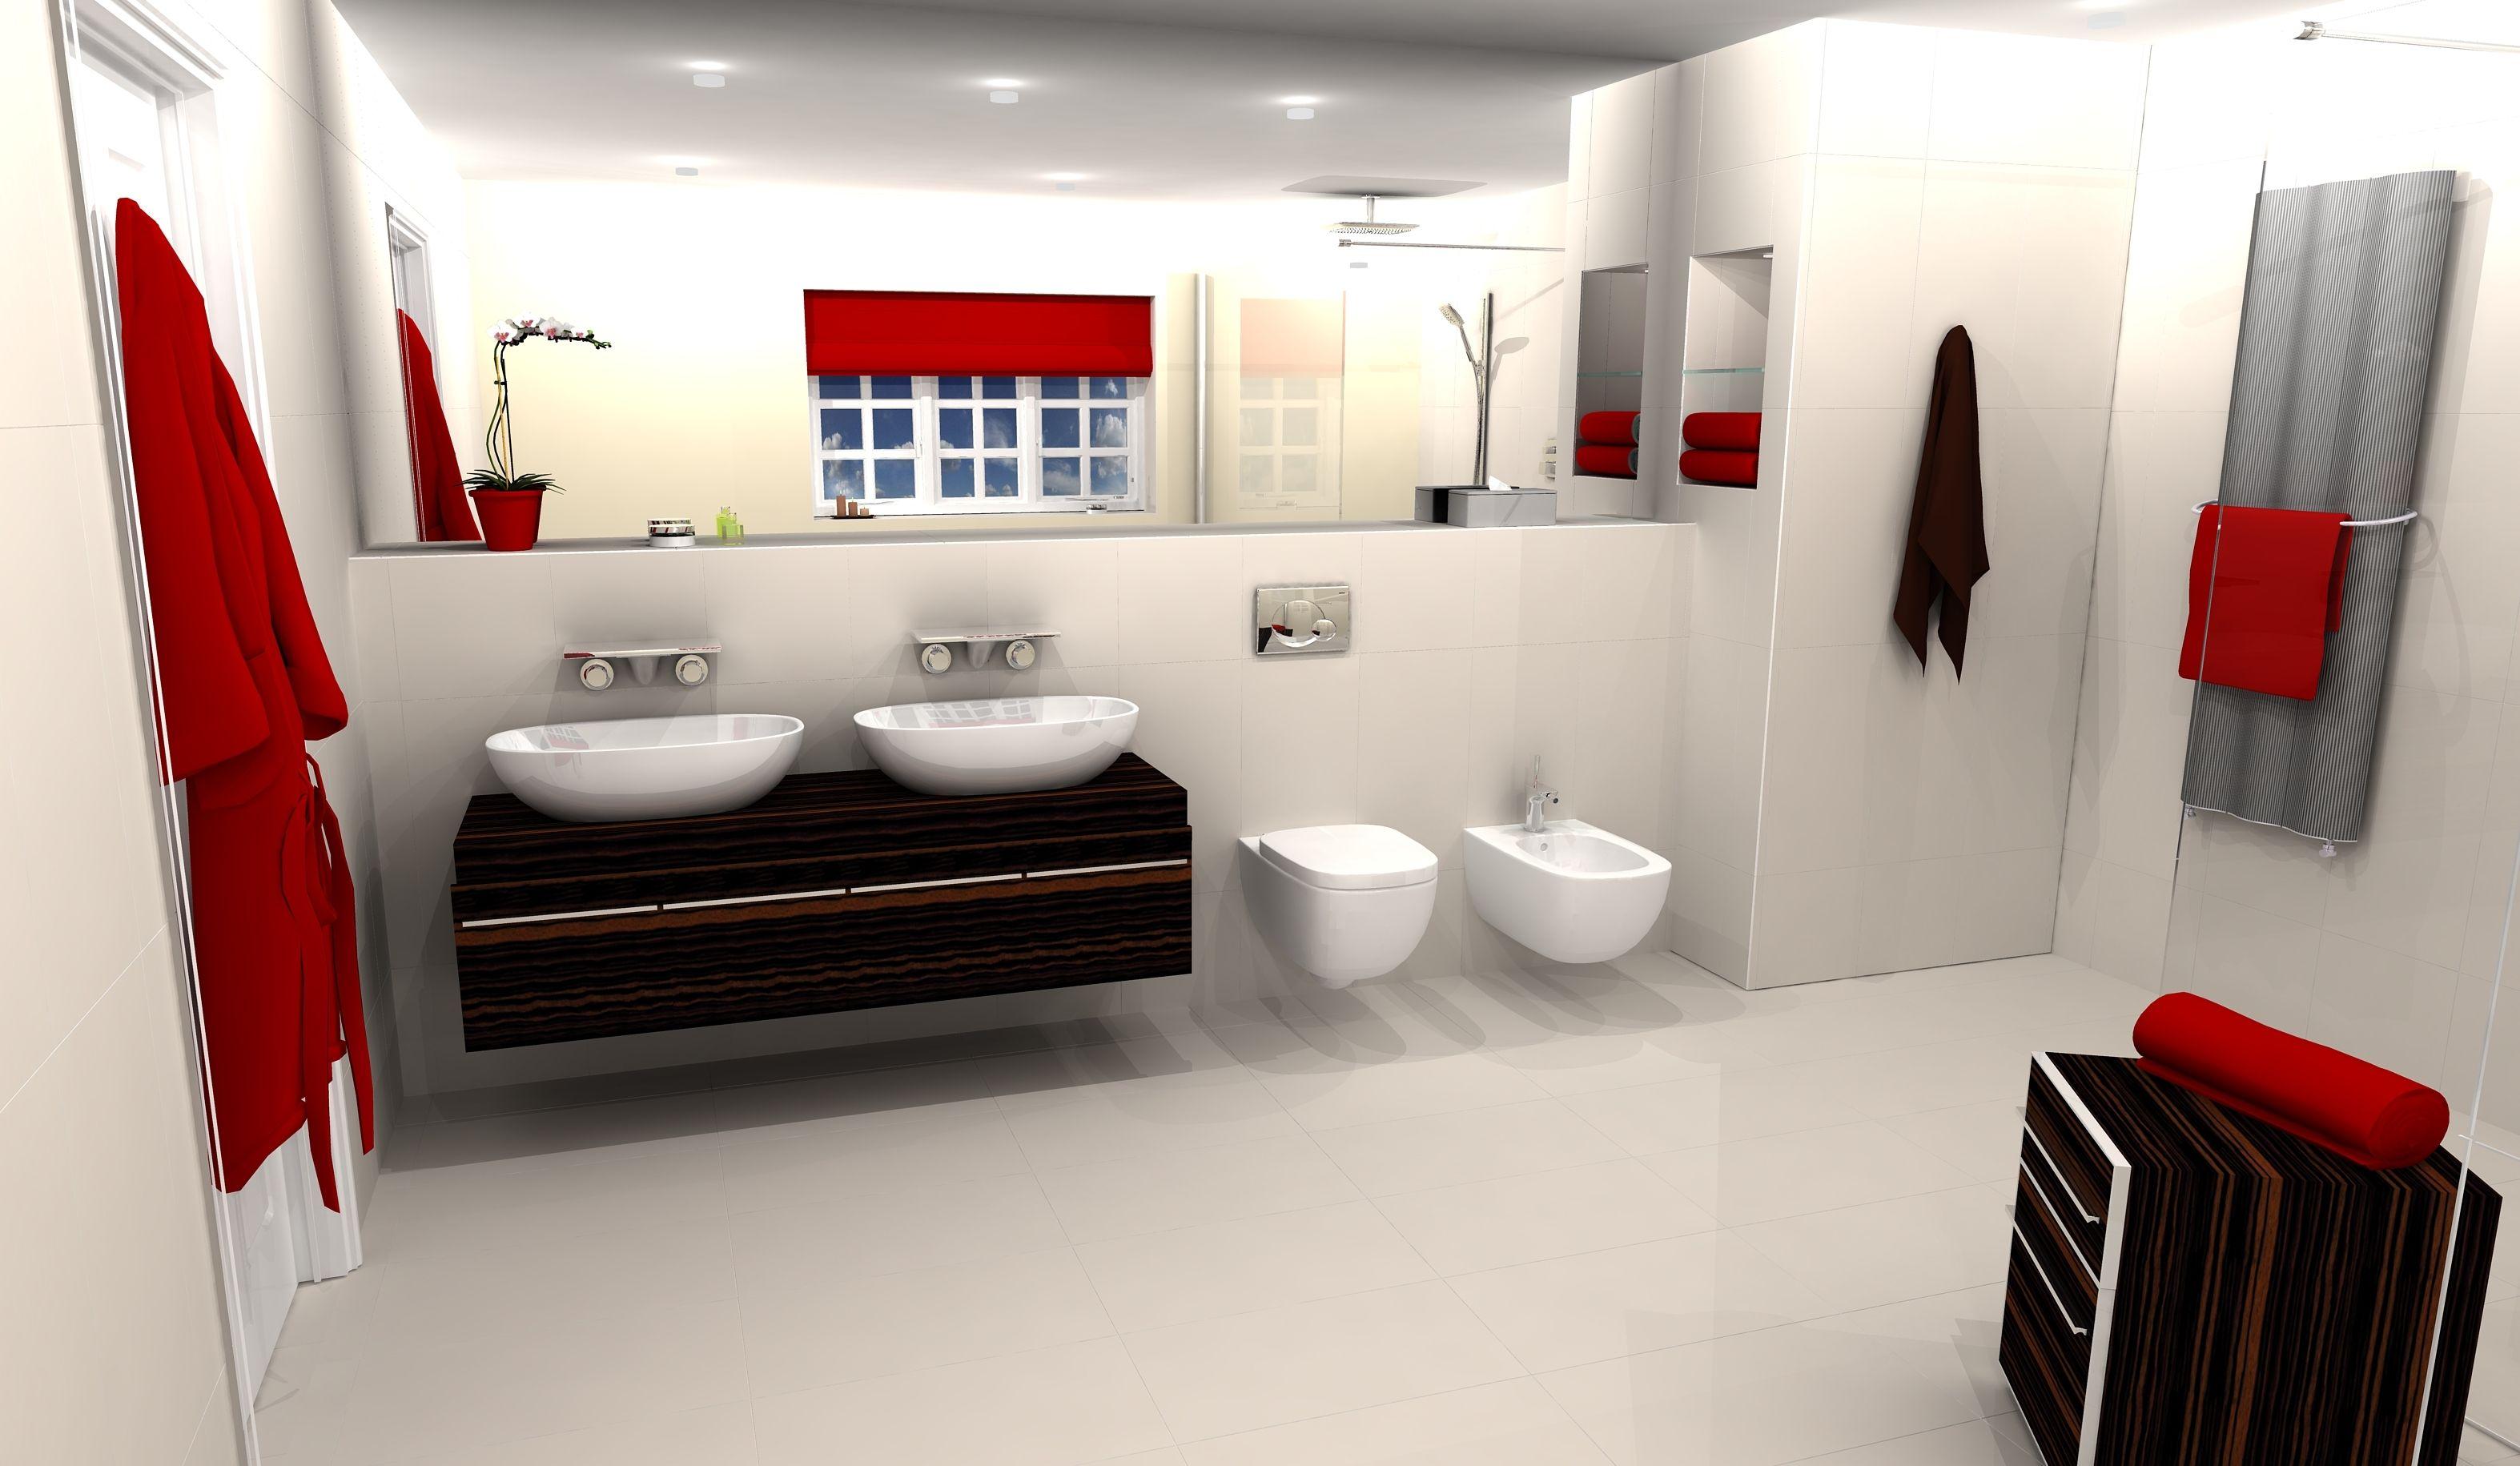 Images Photos design your own virtual bathroom peachy online free rukinet interior netriciaus